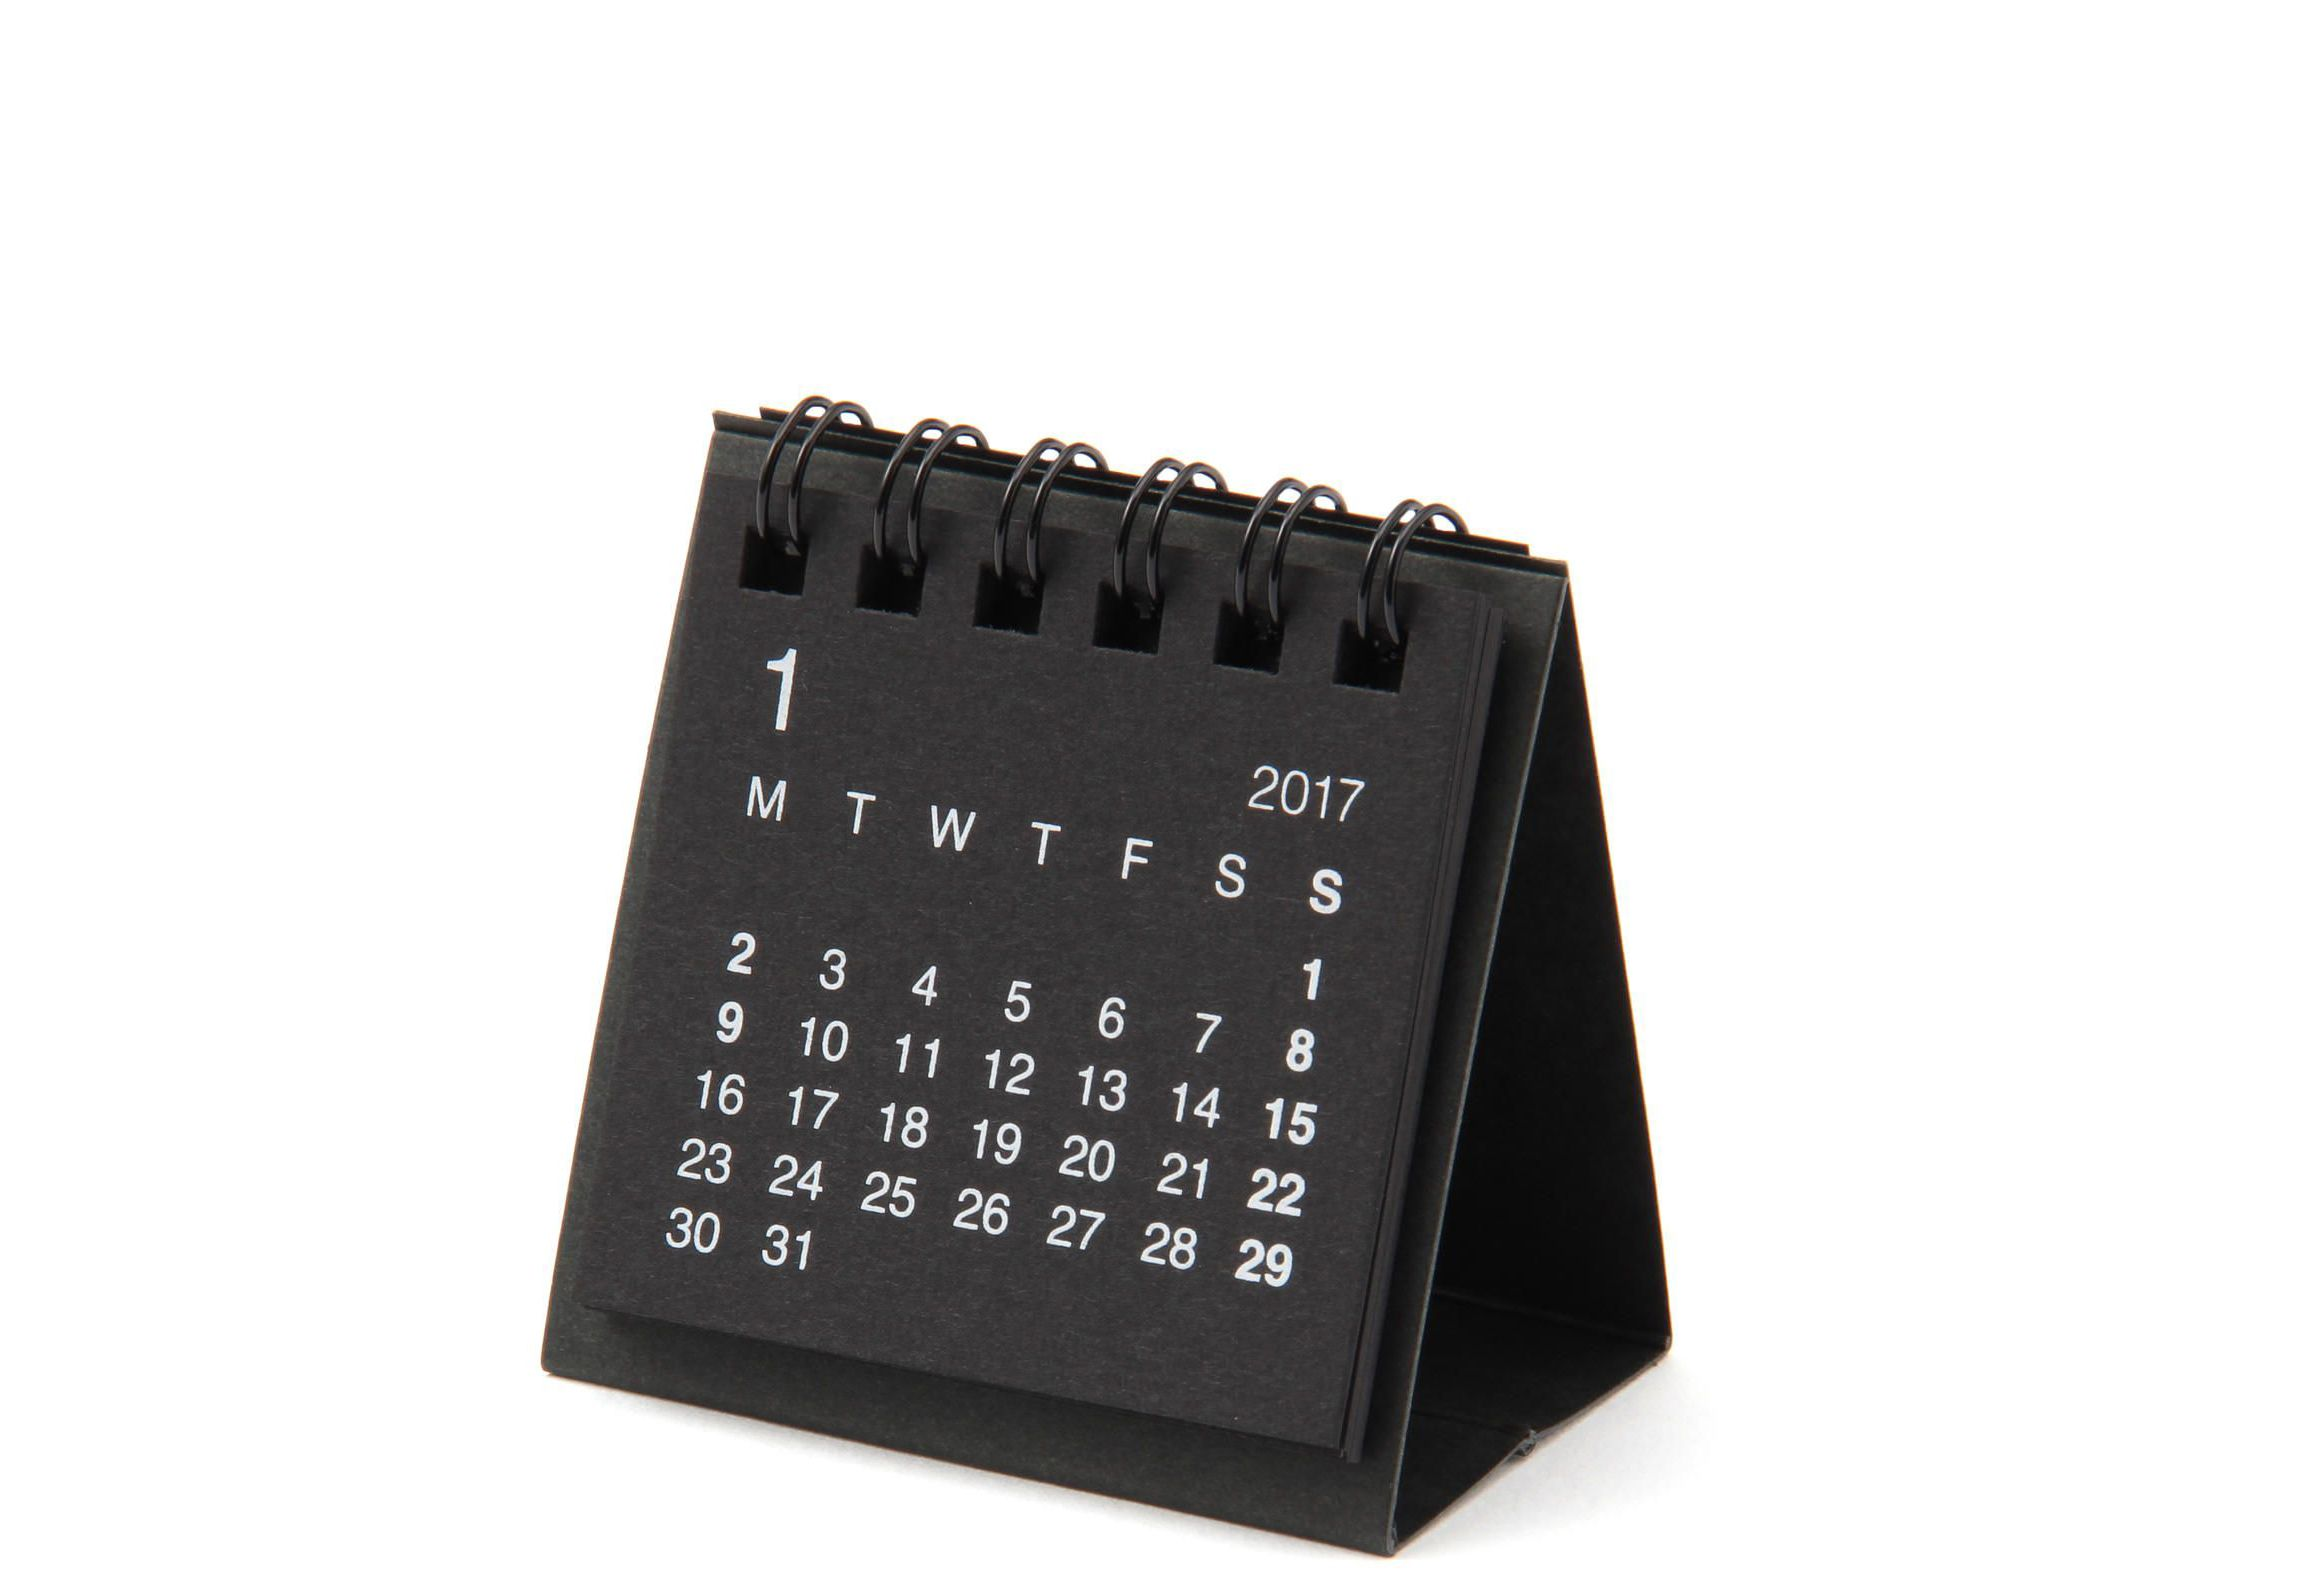 Start From December 2016 to December 2017